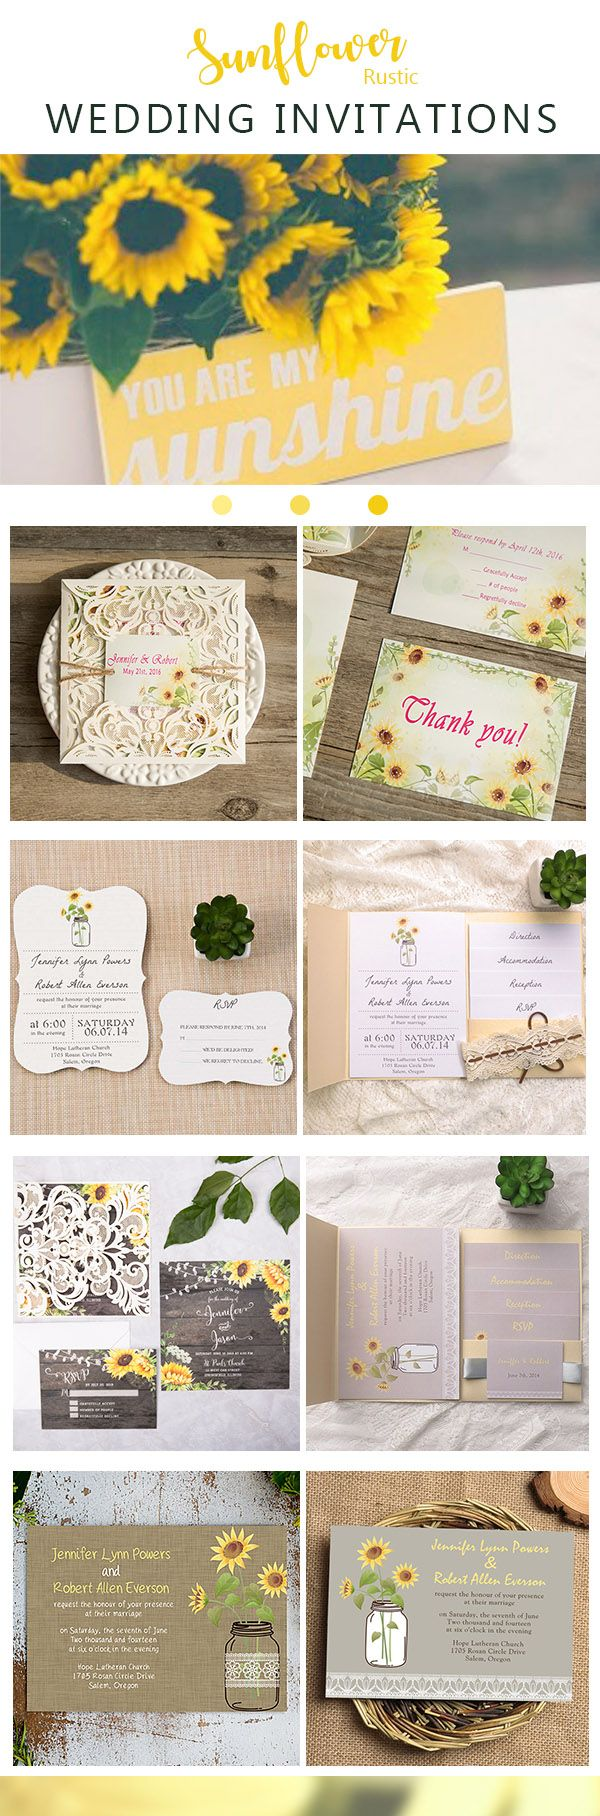 55 best svadobné oznámenia images on Pinterest | Graphic art ...